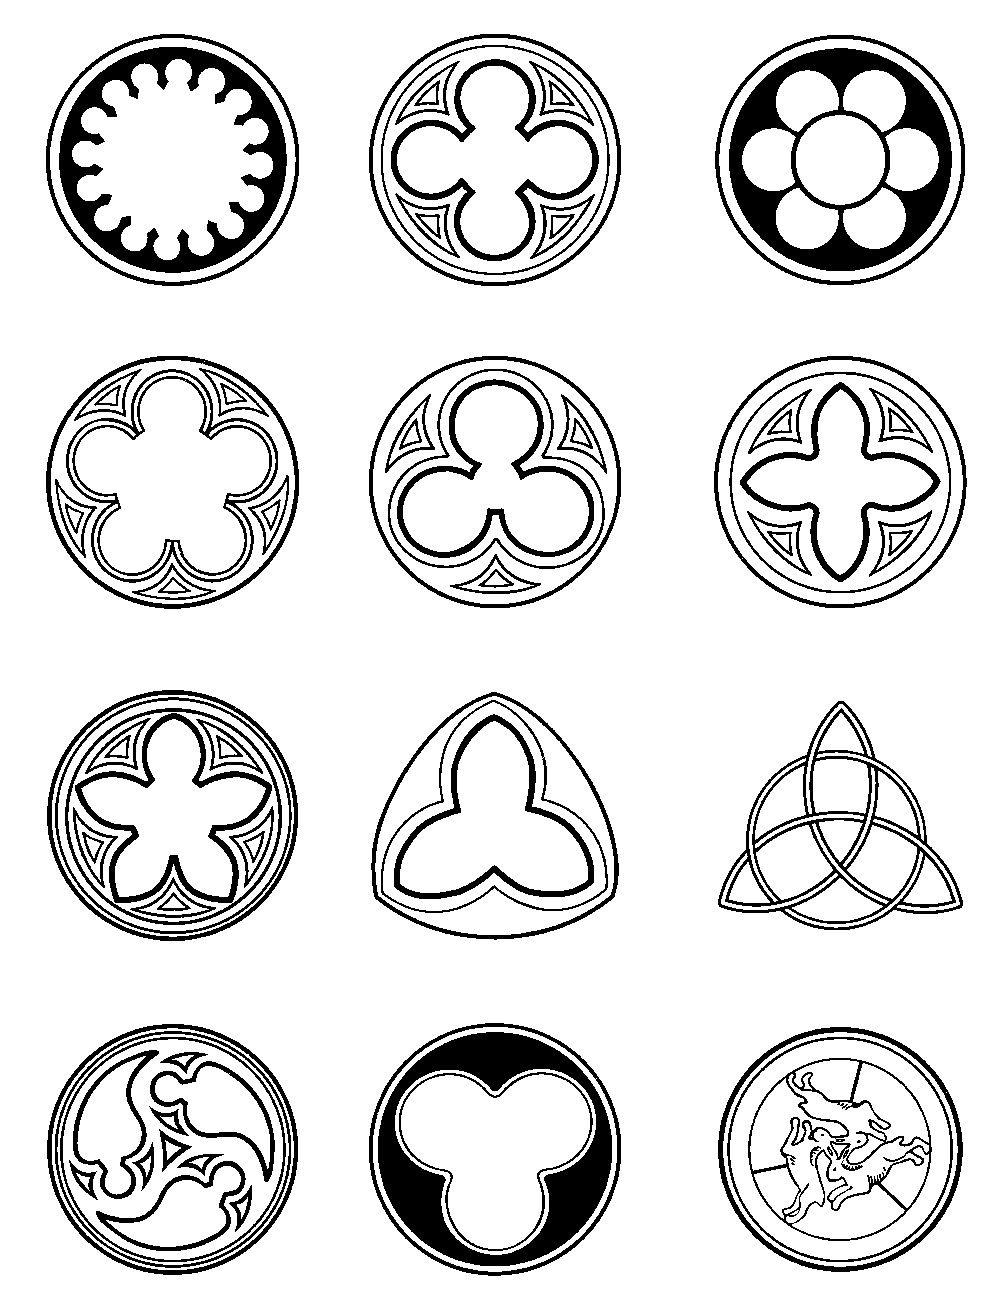 Gothic round trilliant lobes ornaments ornament 3 celtic gothic round trilliant lobes ornaments gothic windowsbyzantinemiddle ages celticsymbolsarchitecturemedievalmedieval timesglyphs biocorpaavc Choice Image